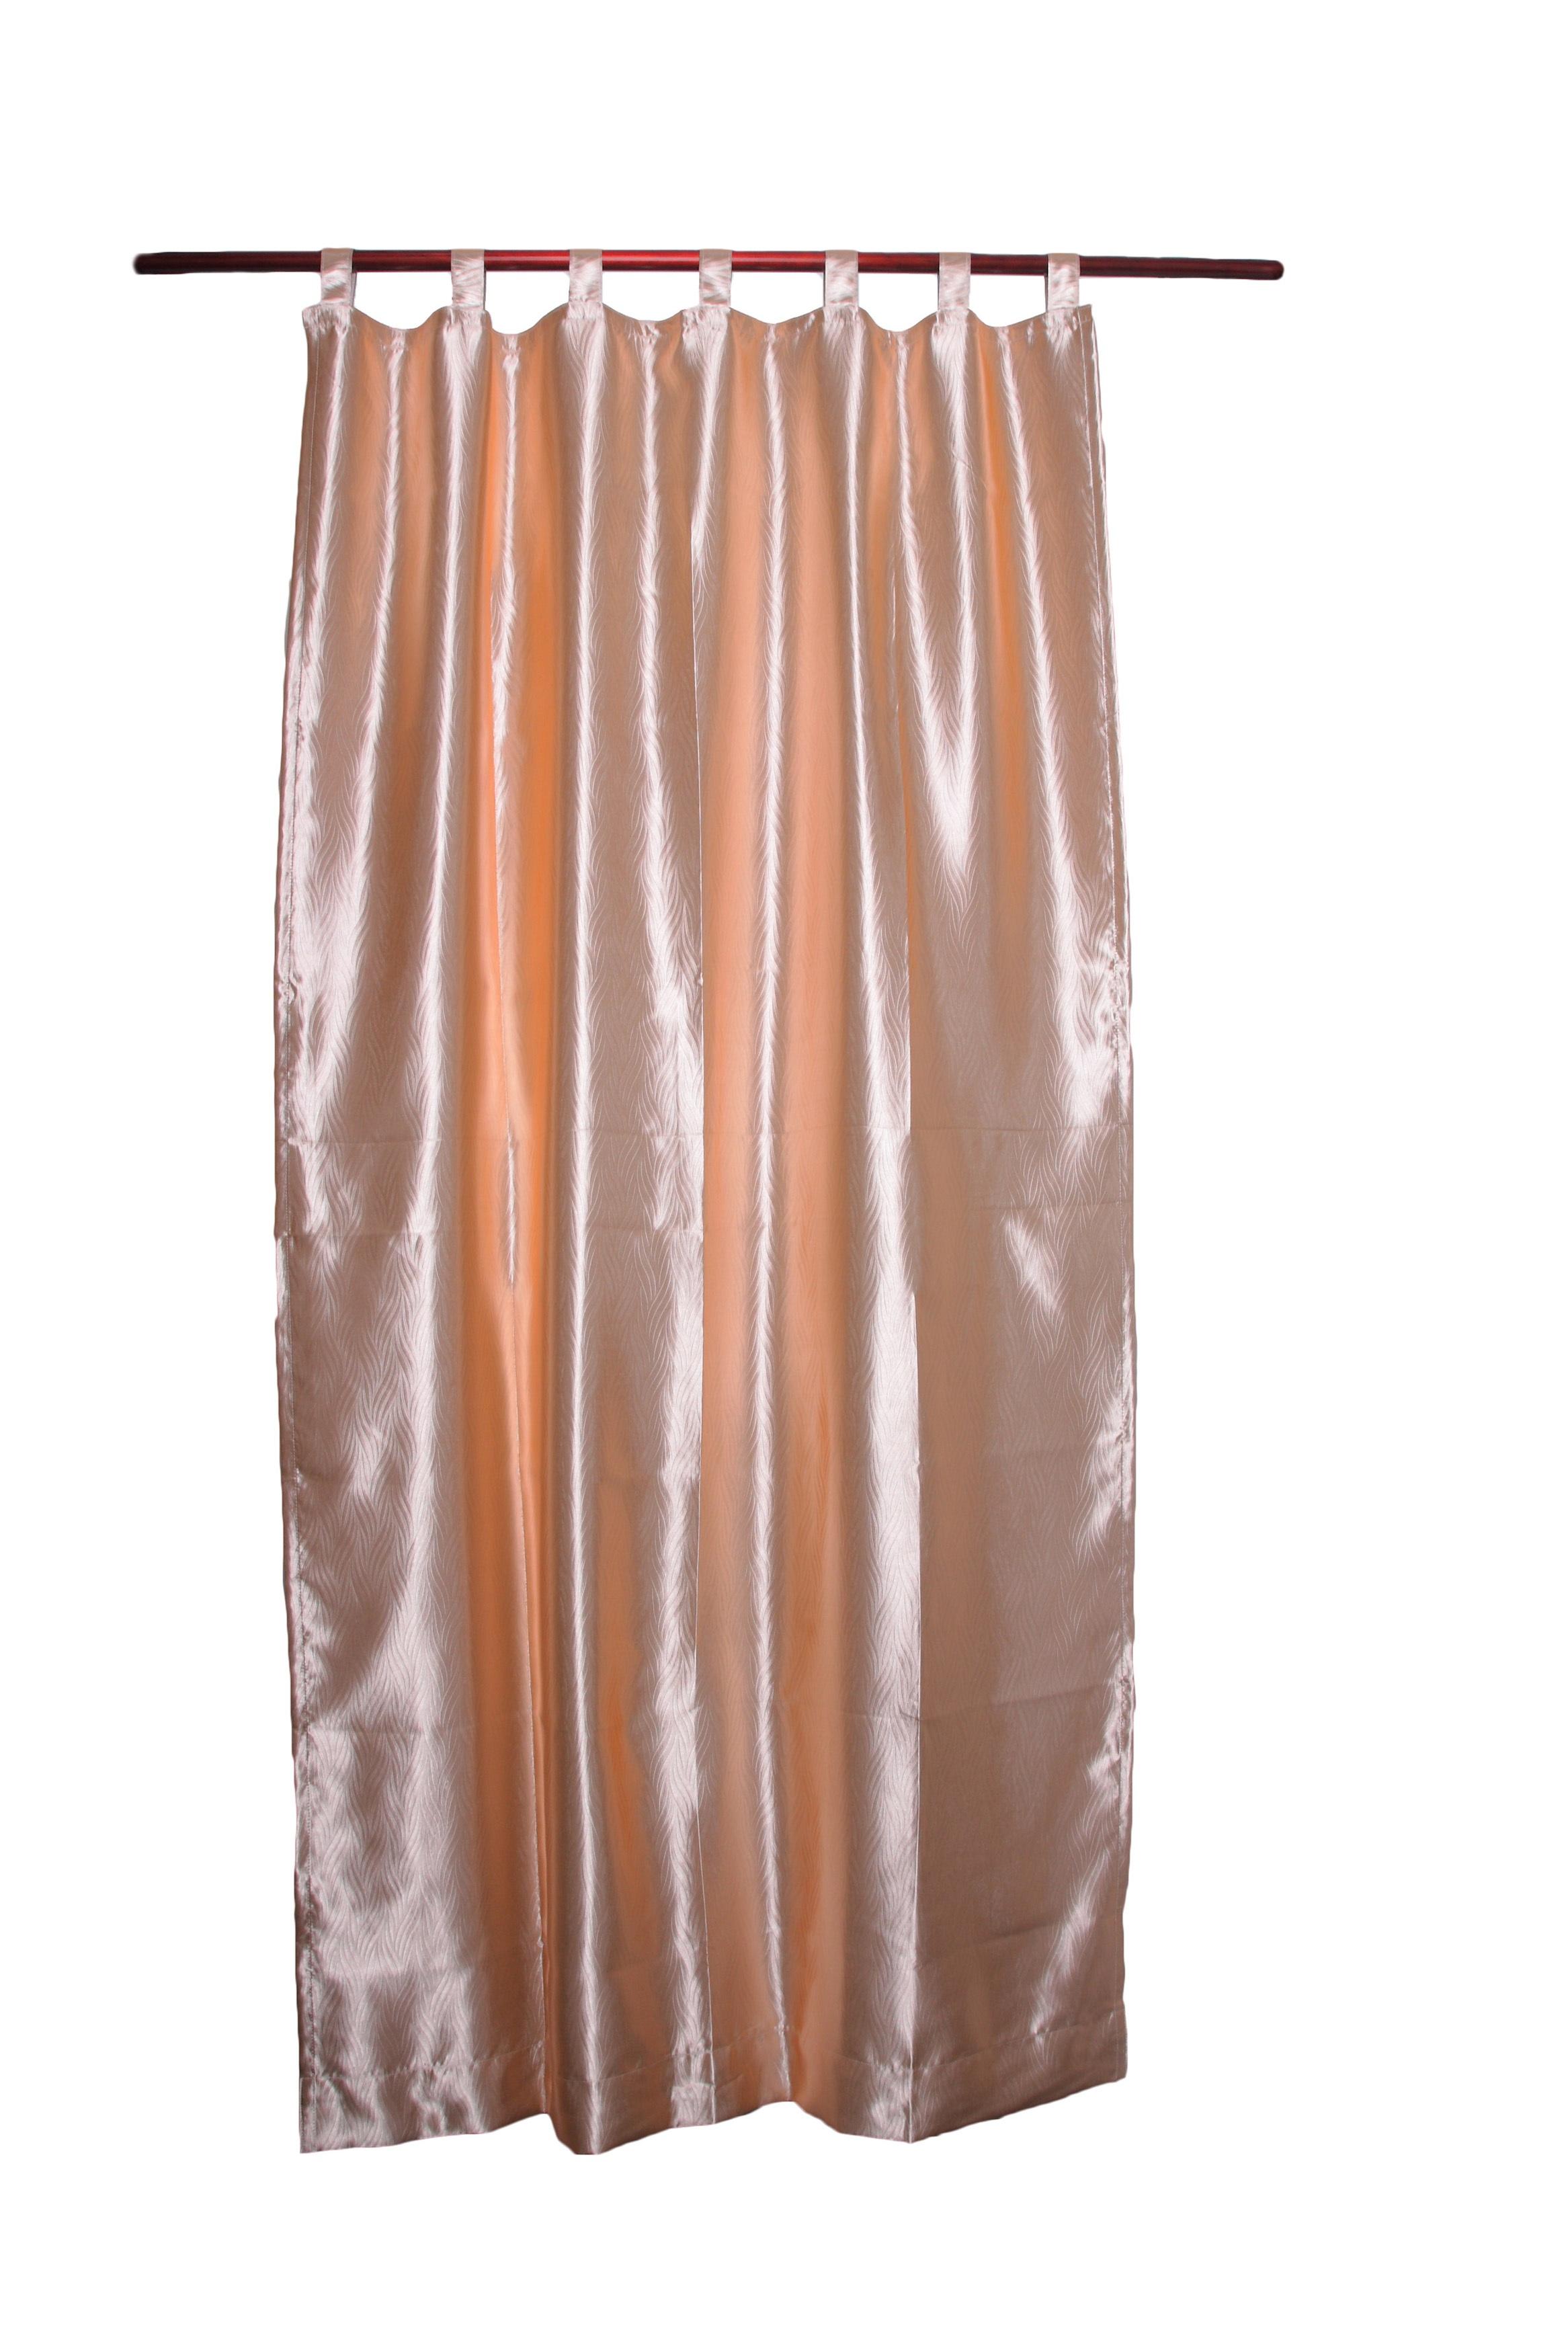 marrn cortina ropa ropa de calle material diseo de interiores producto textil vestido satn angie cortinas